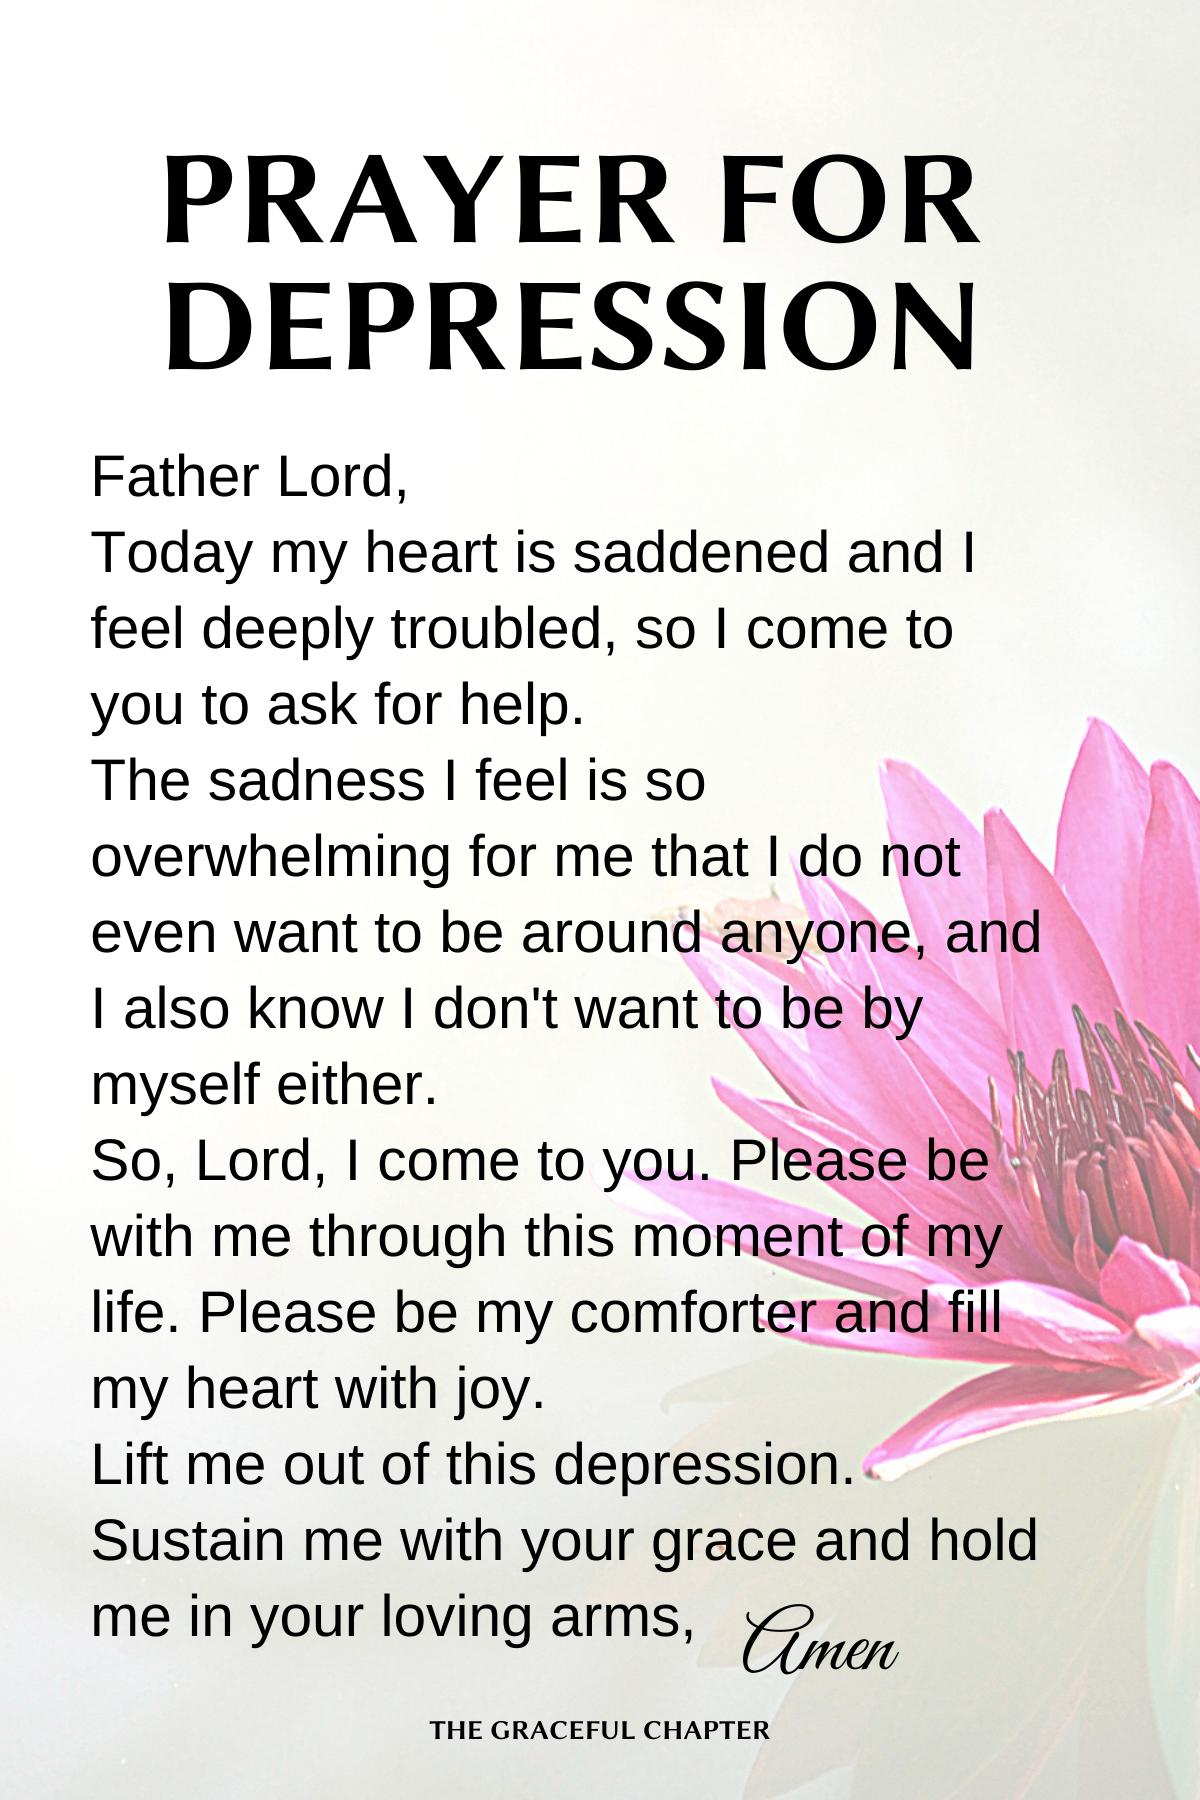 Prayer for depression